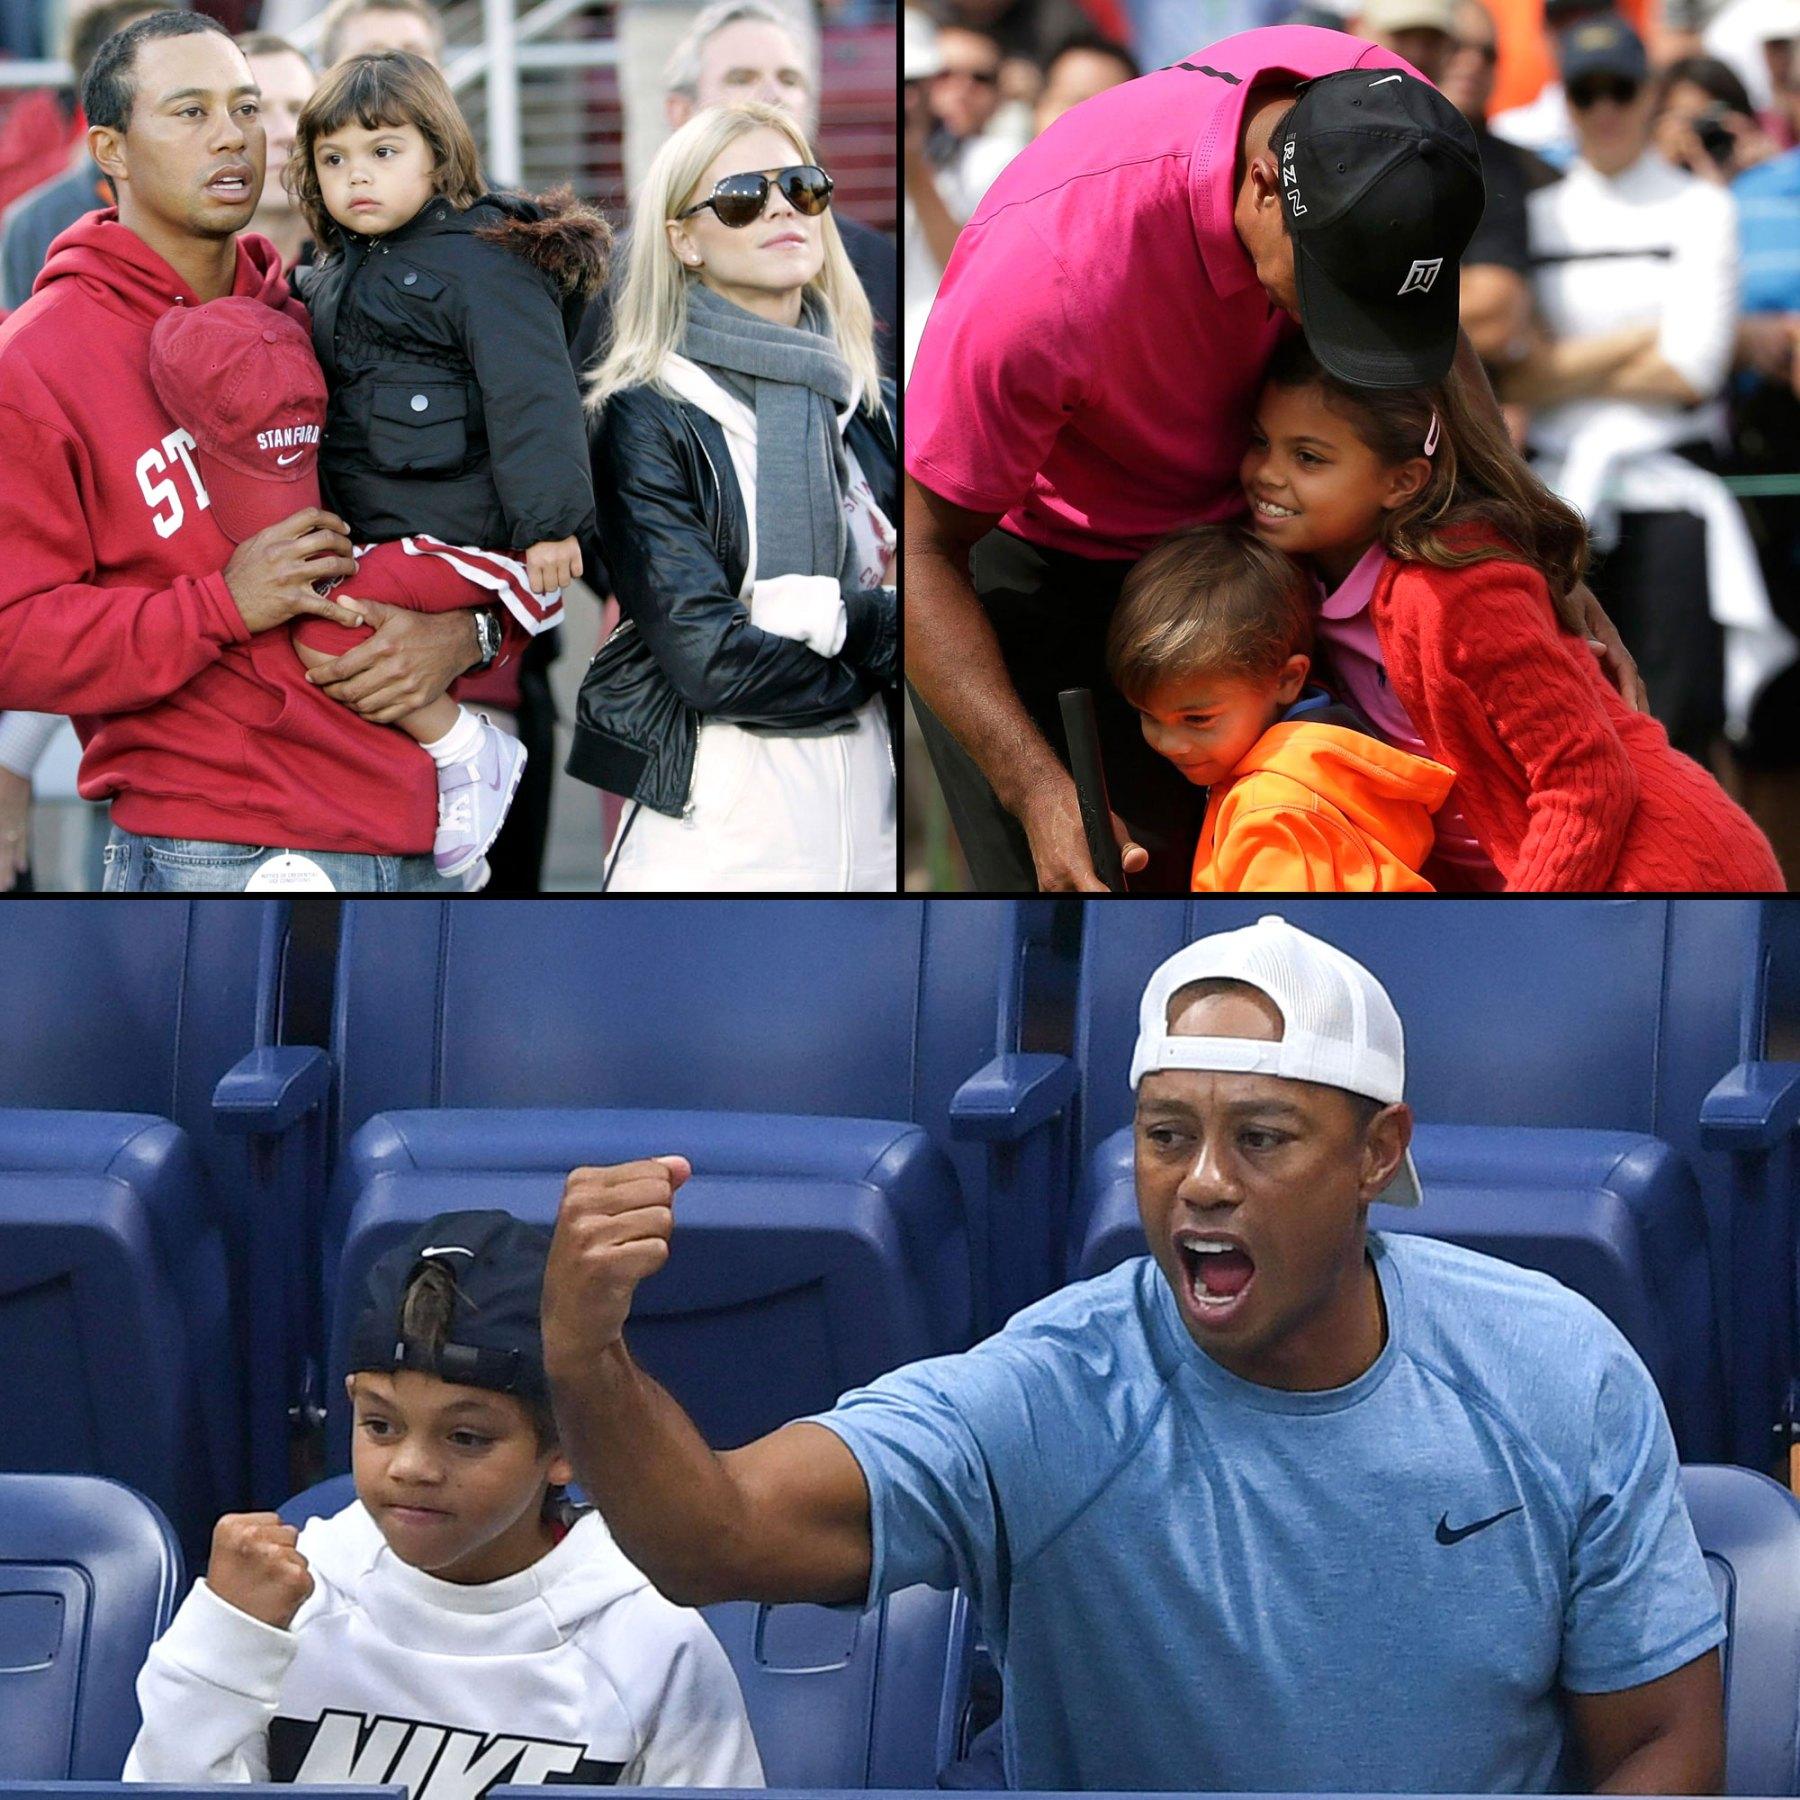 Tiger Woods' Family Album: Pics With His, Elin Nordegren's ...